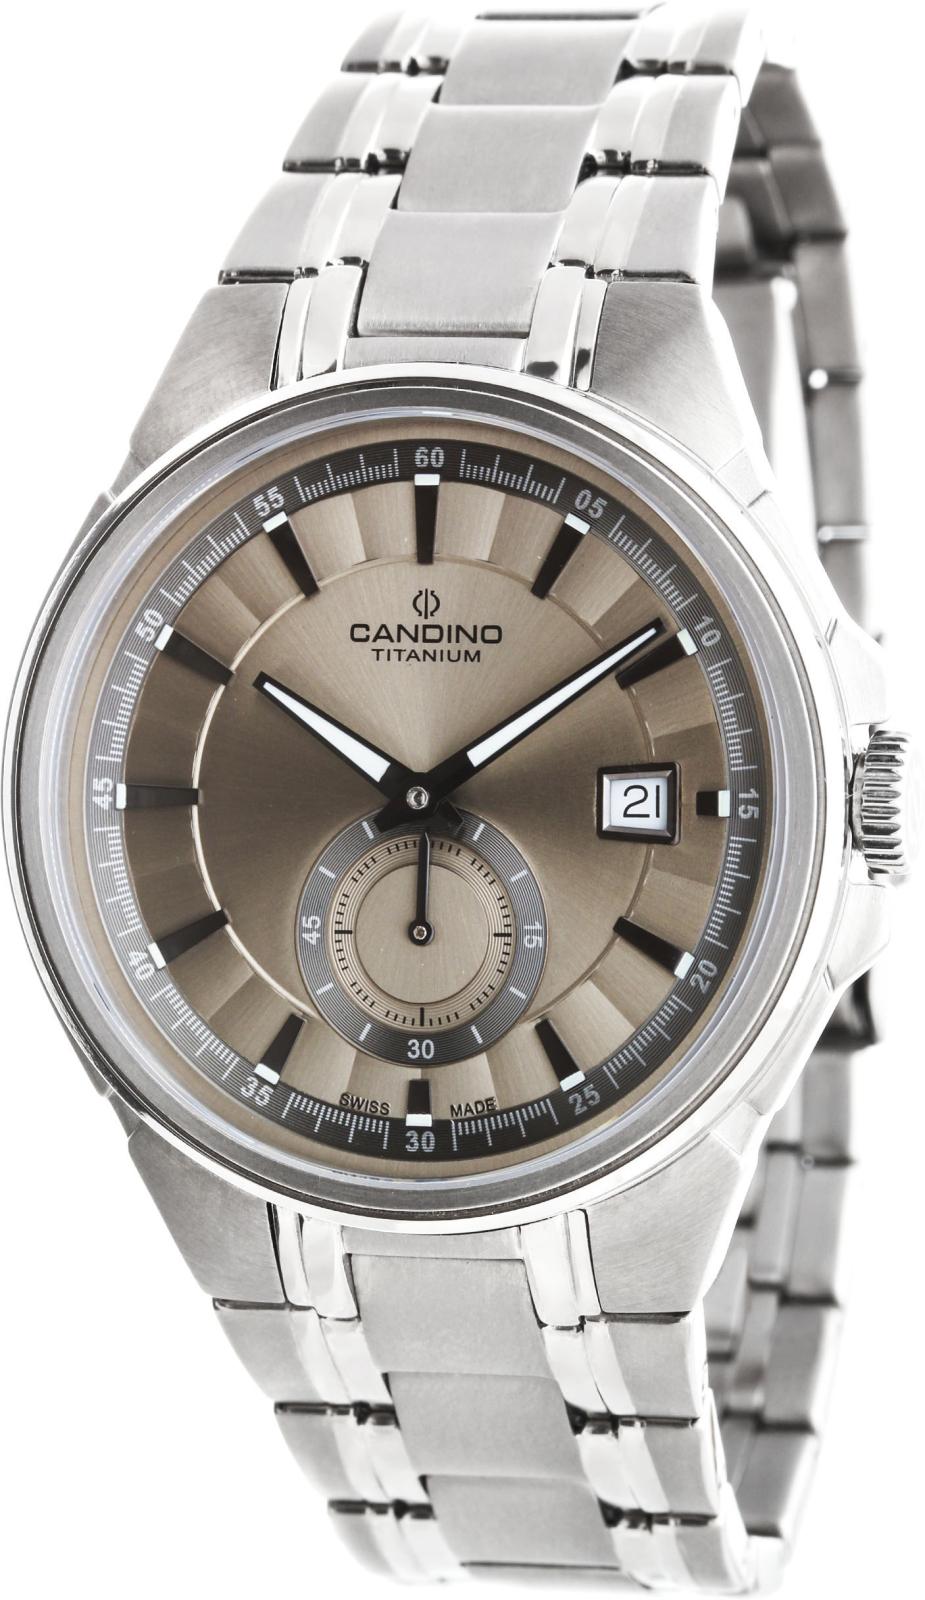 Candino Casual C4604/2Наручные часы<br>Швейцарские часы Candino Casual C4604/2<br><br>Пол: Мужские<br>Страна-производитель: Швейцария<br>Механизм: Кварцевый<br>Материал корпуса: Титан<br>Материал ремня/браслета: Титан<br>Водозащита, диапазон: None<br>Стекло: Сапфировое<br>Толщина корпуса: None<br>Стиль: None